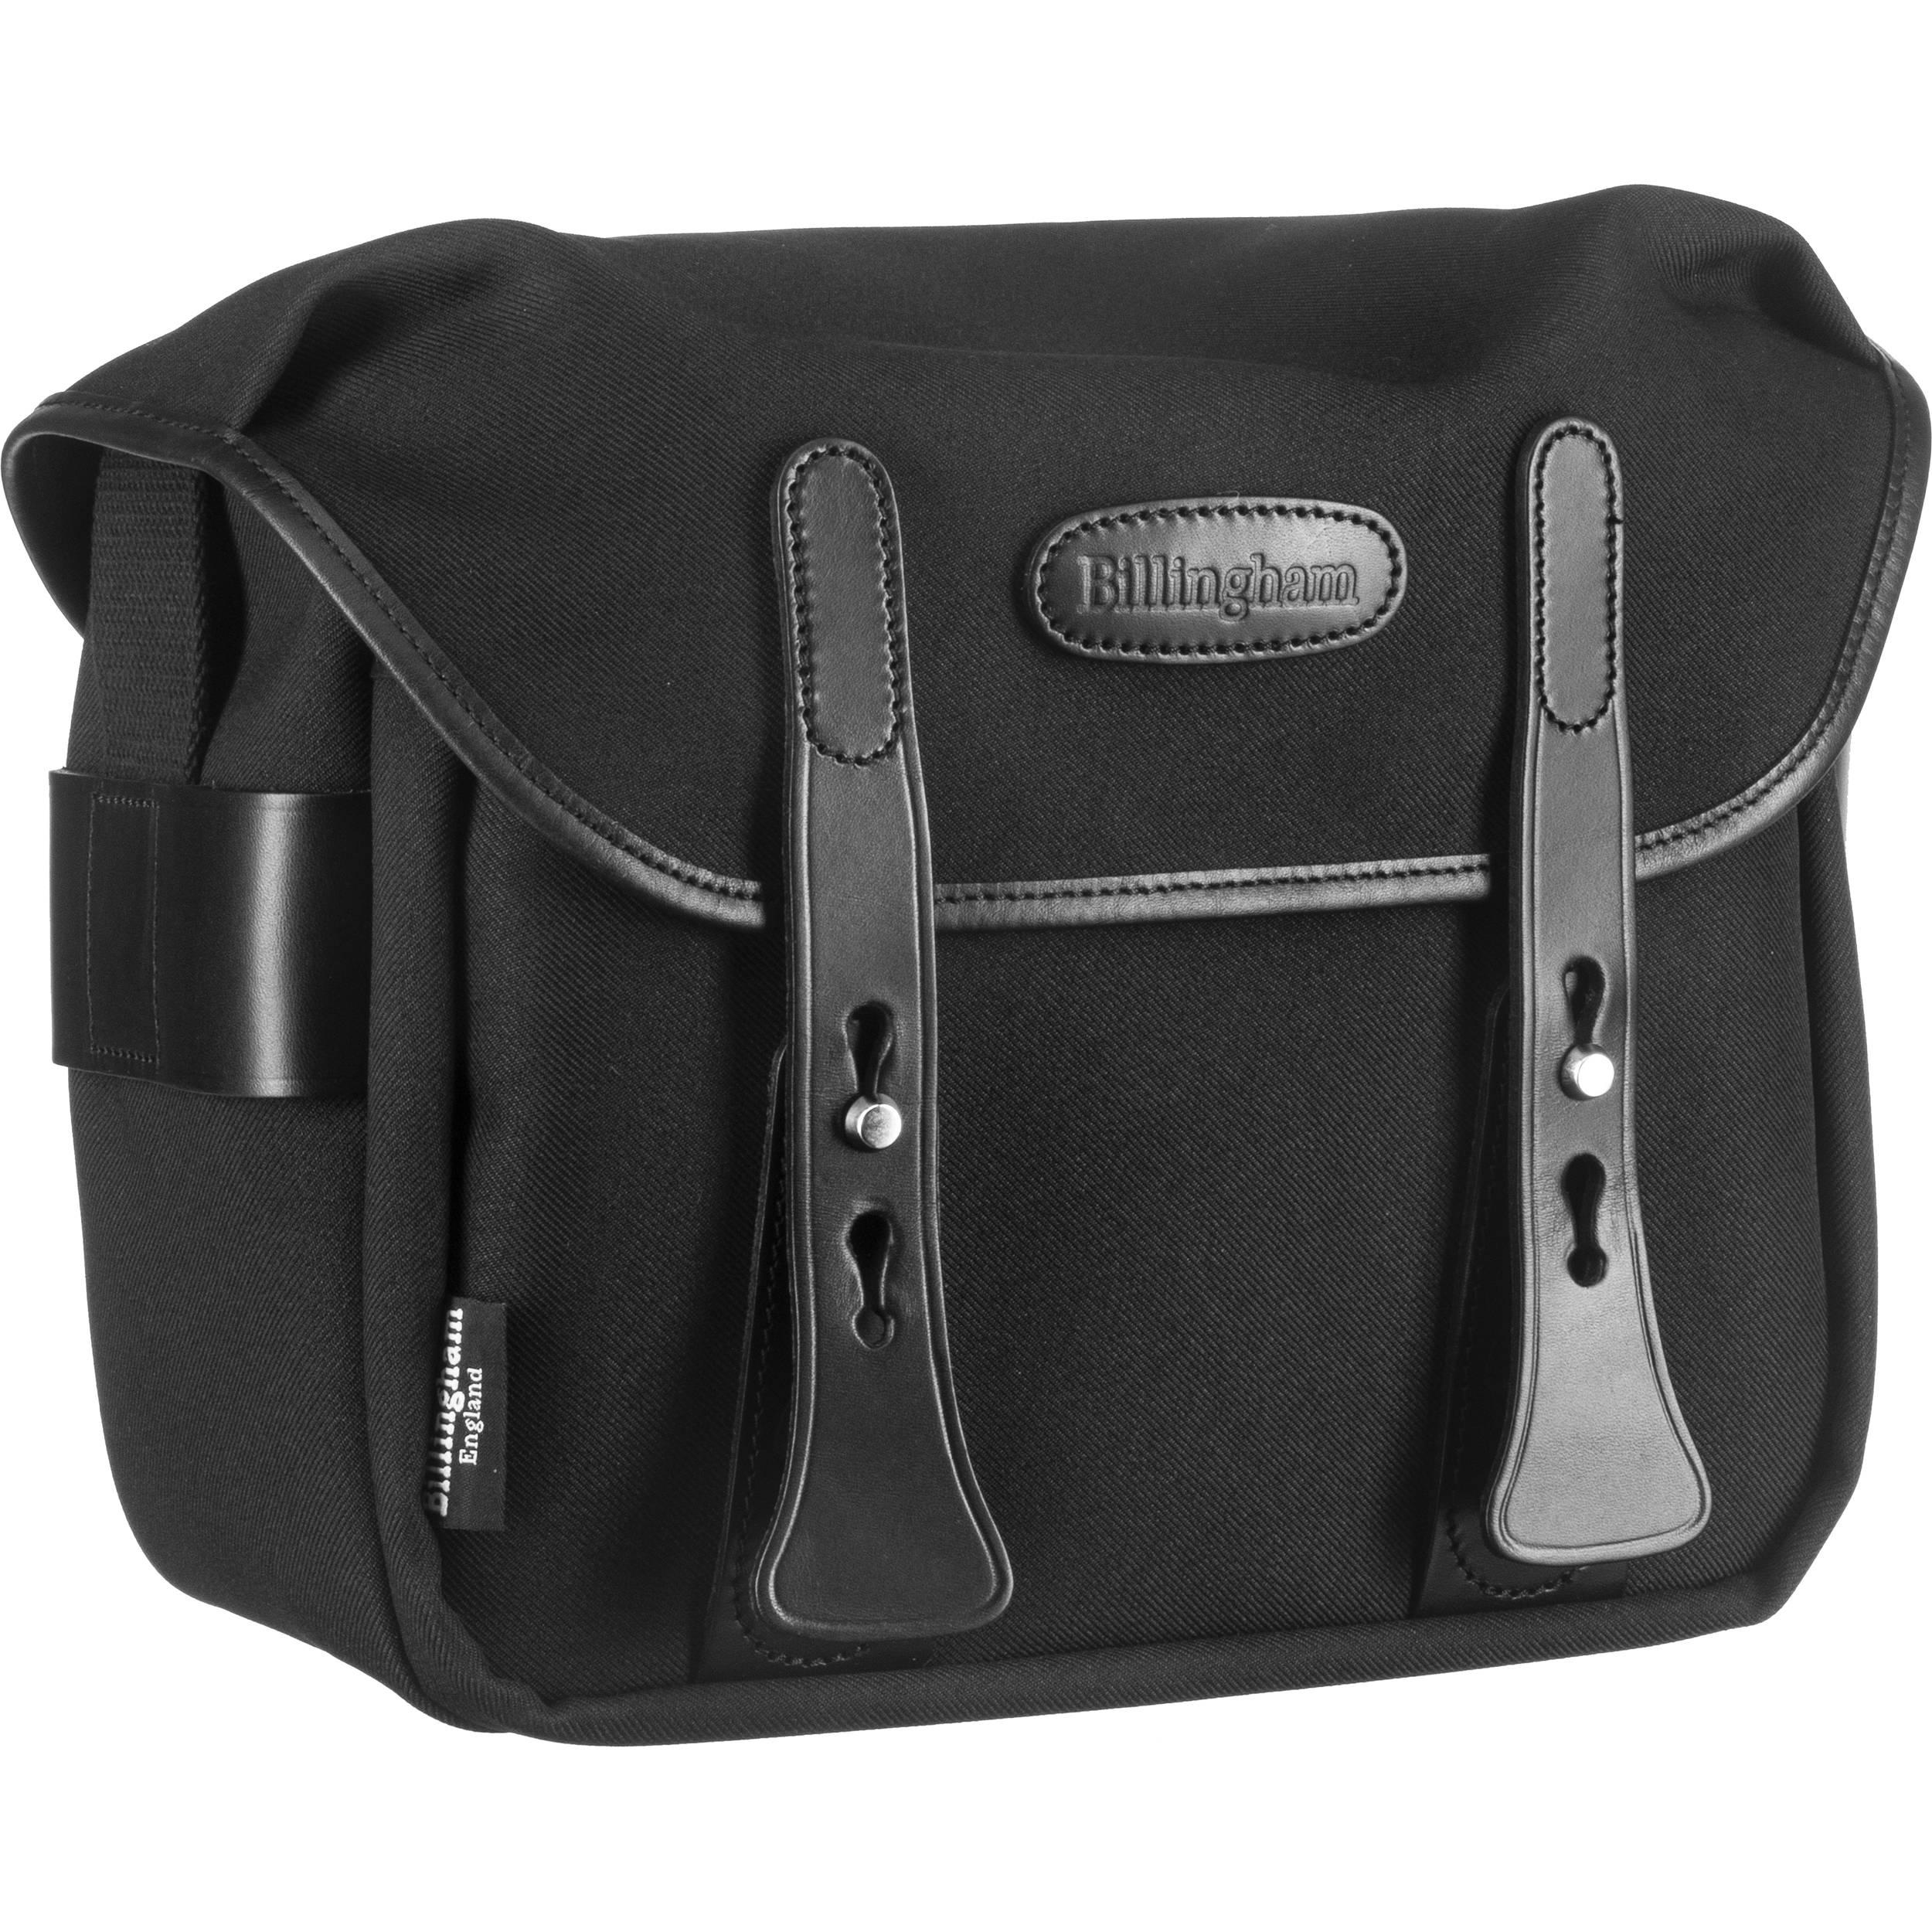 Billingham F Stop 2 8 Camera Bag Black With Leather Trim